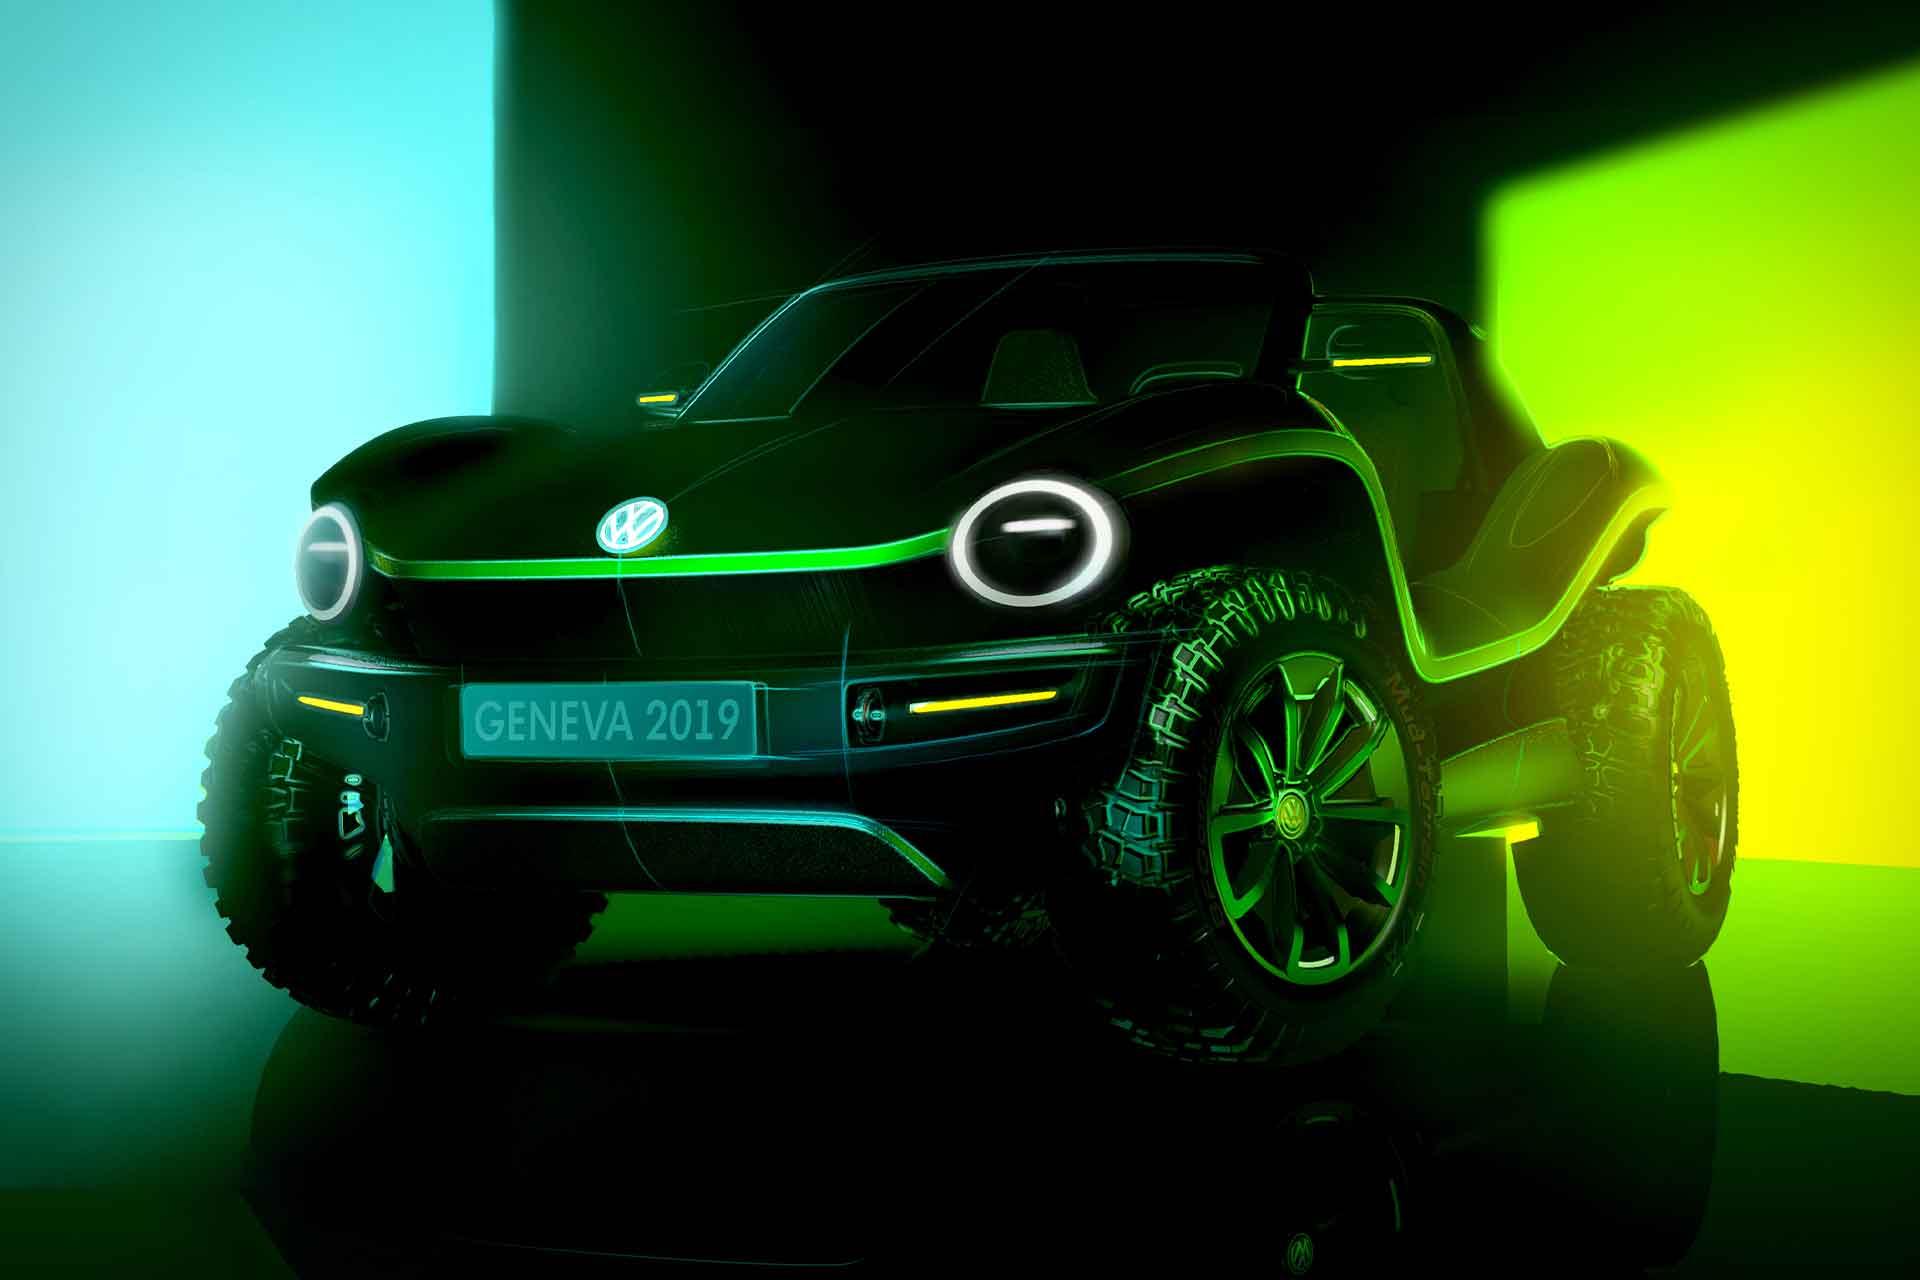 Vw Dune Buggy Concept on Vw Beetle Dune Concept